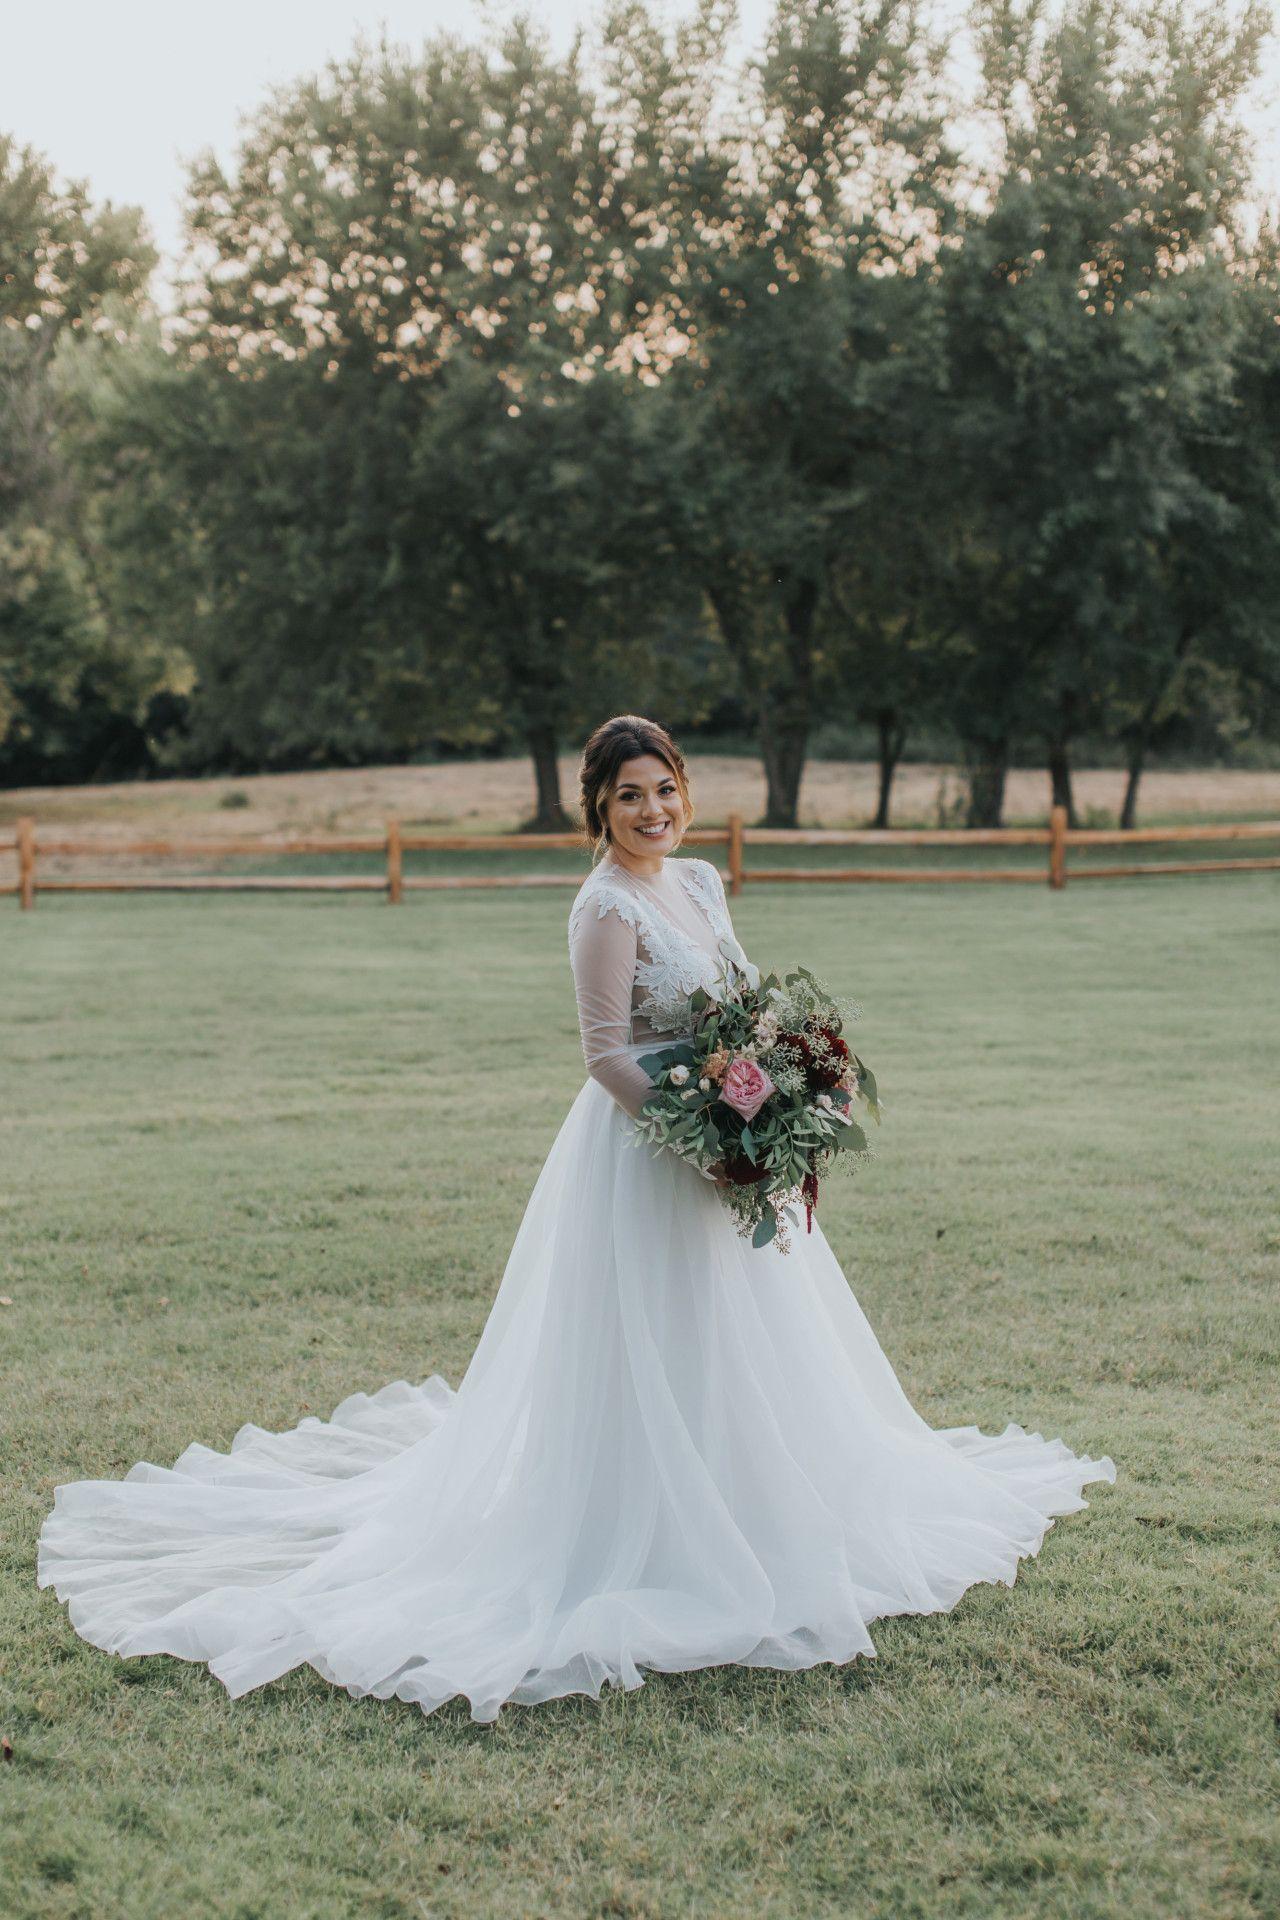 Sheer long sleeve wedding dress  long sleeve wedding dress  sheer wedding gown  bohemian wedding